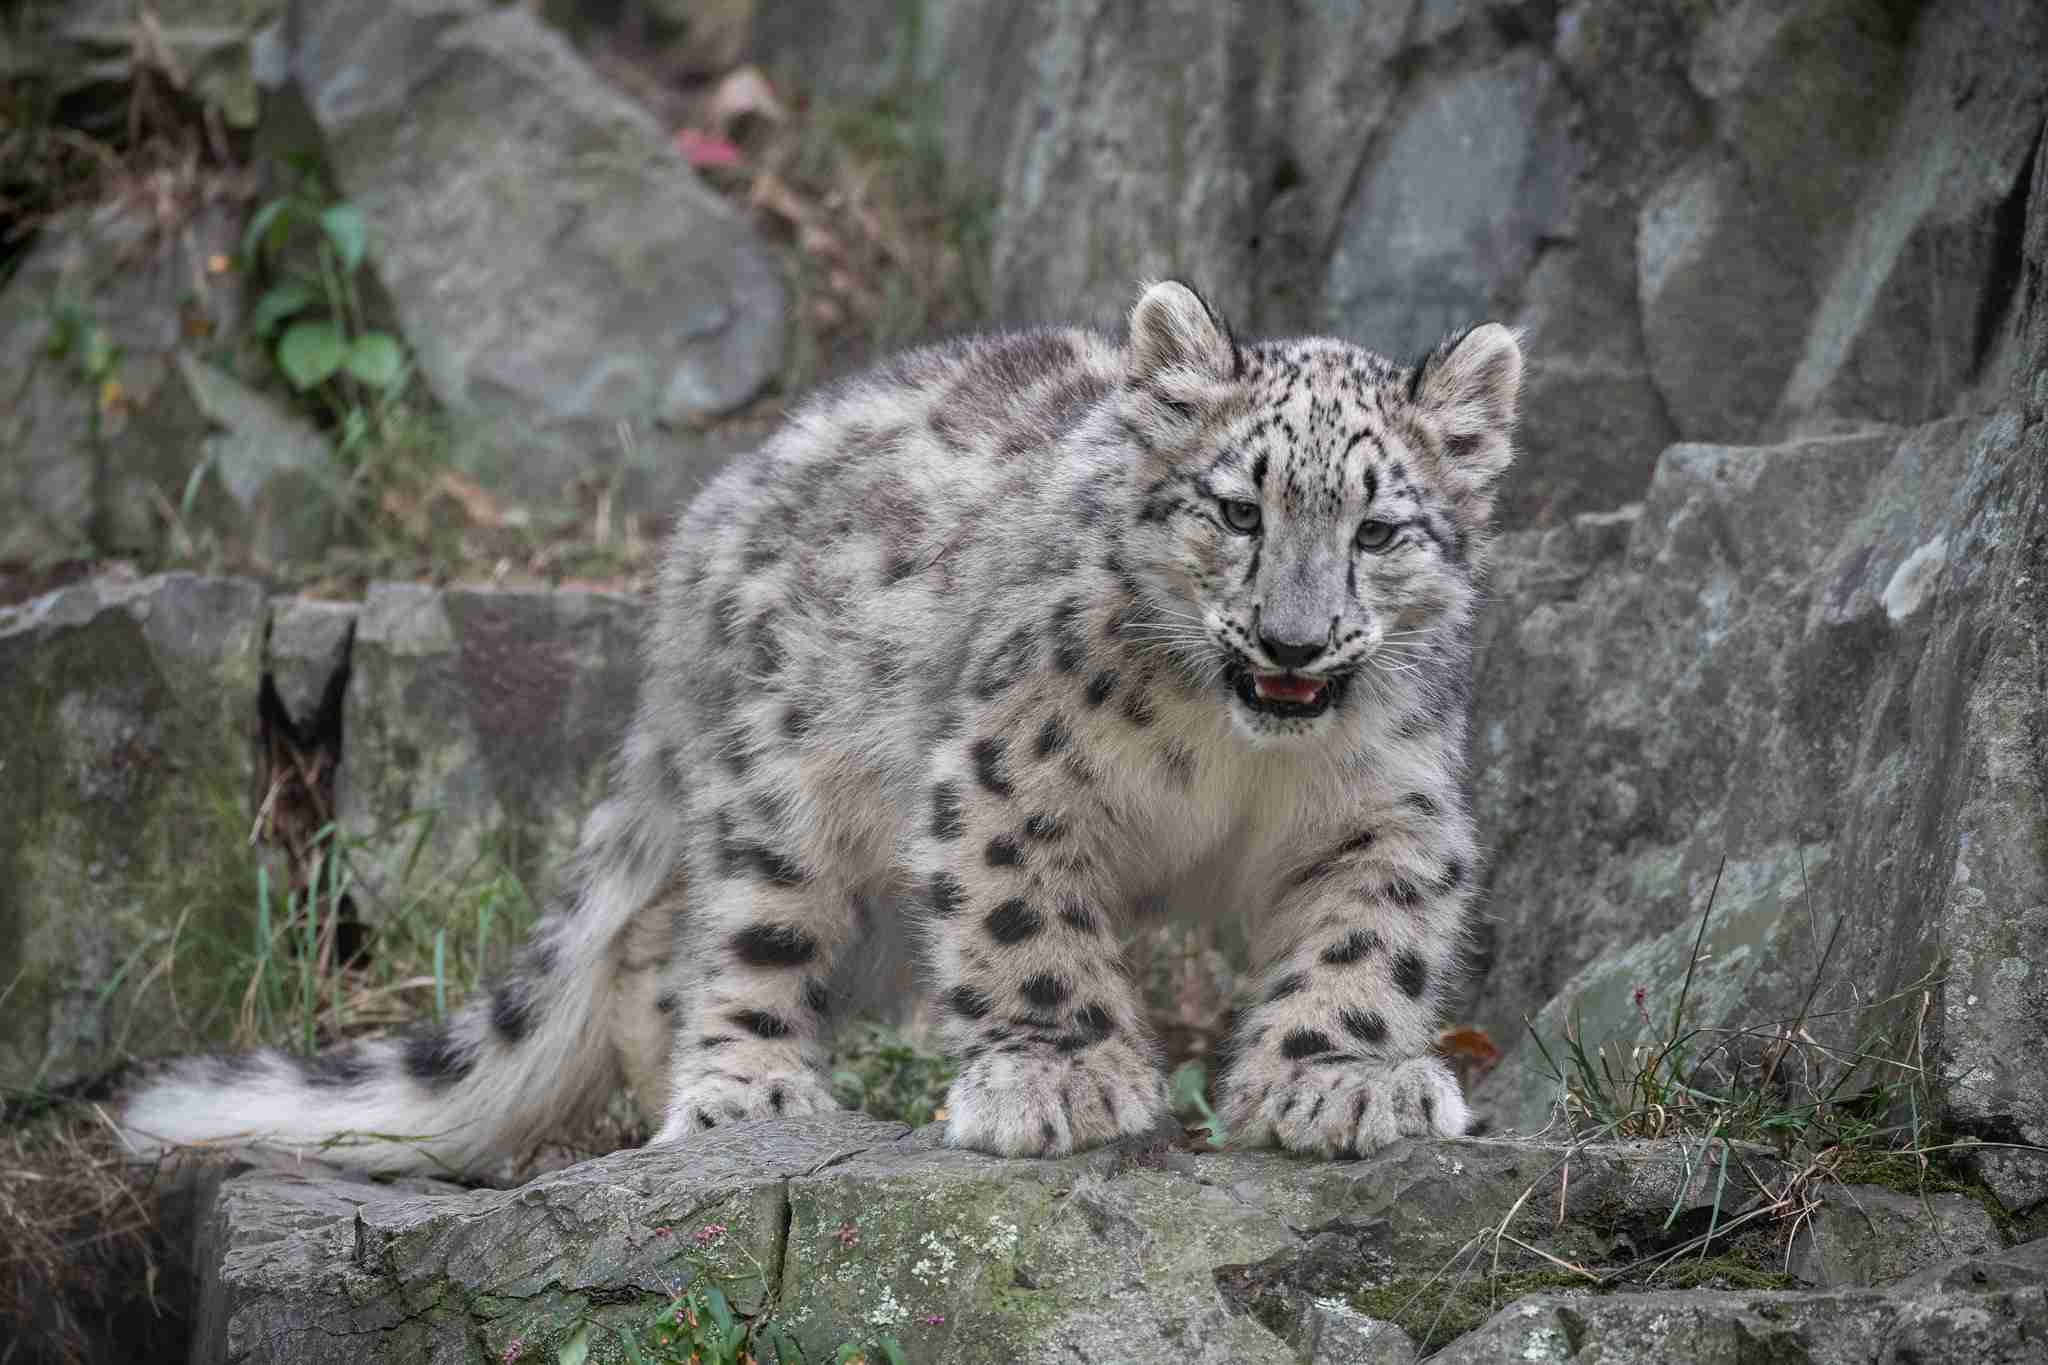 Snow leopard sitting on a rock.